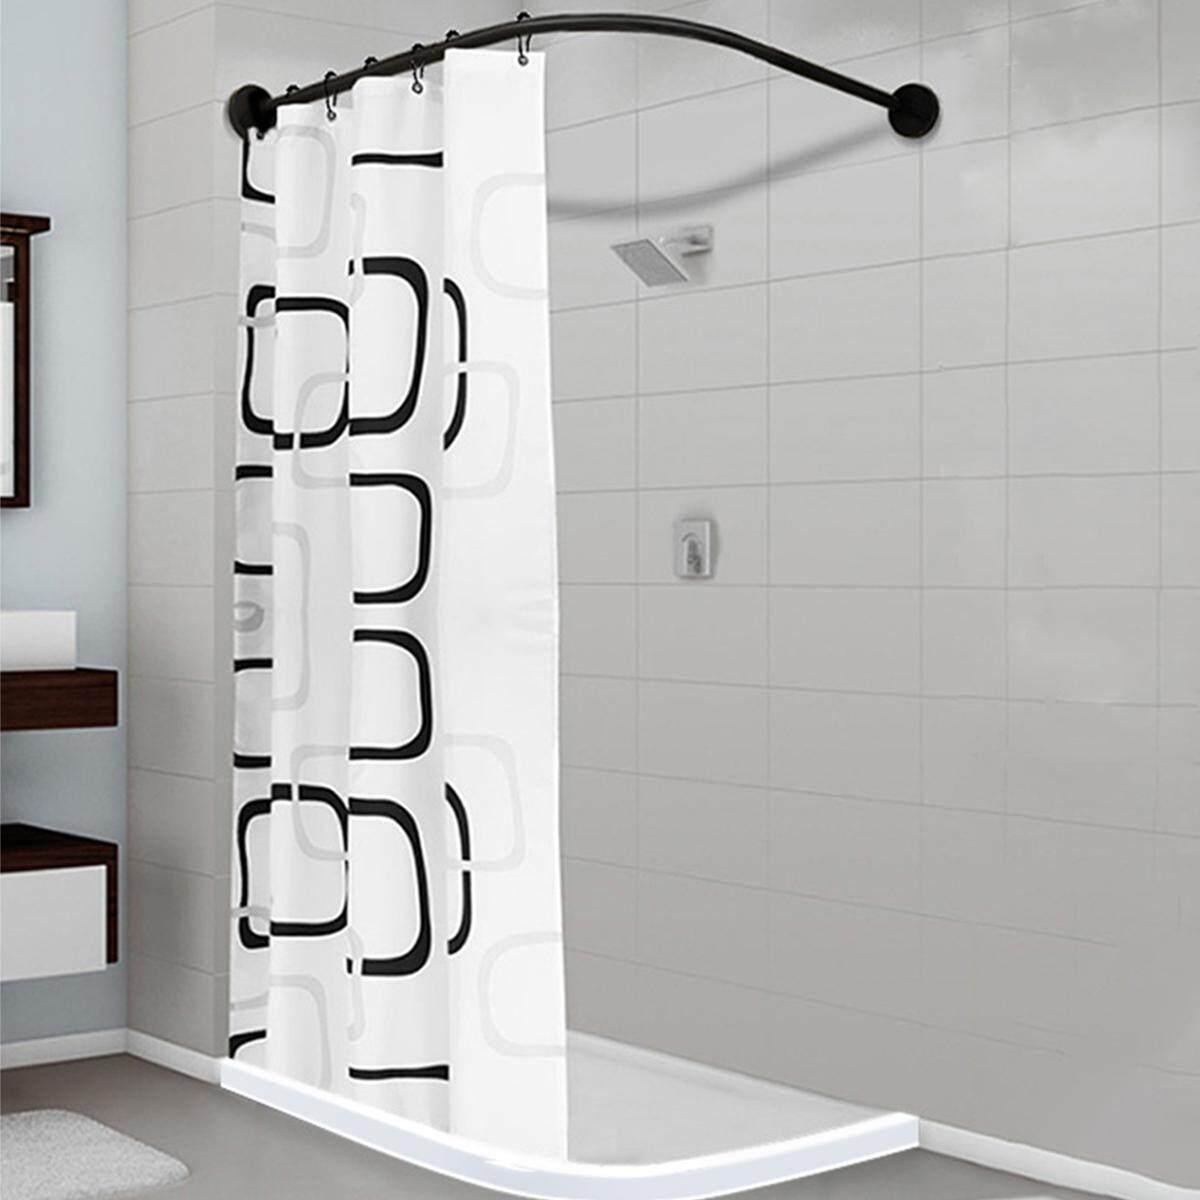 L Shape Adjustable Stainless Steel Shower Curtain Rod Pole 90 130cm Retractable